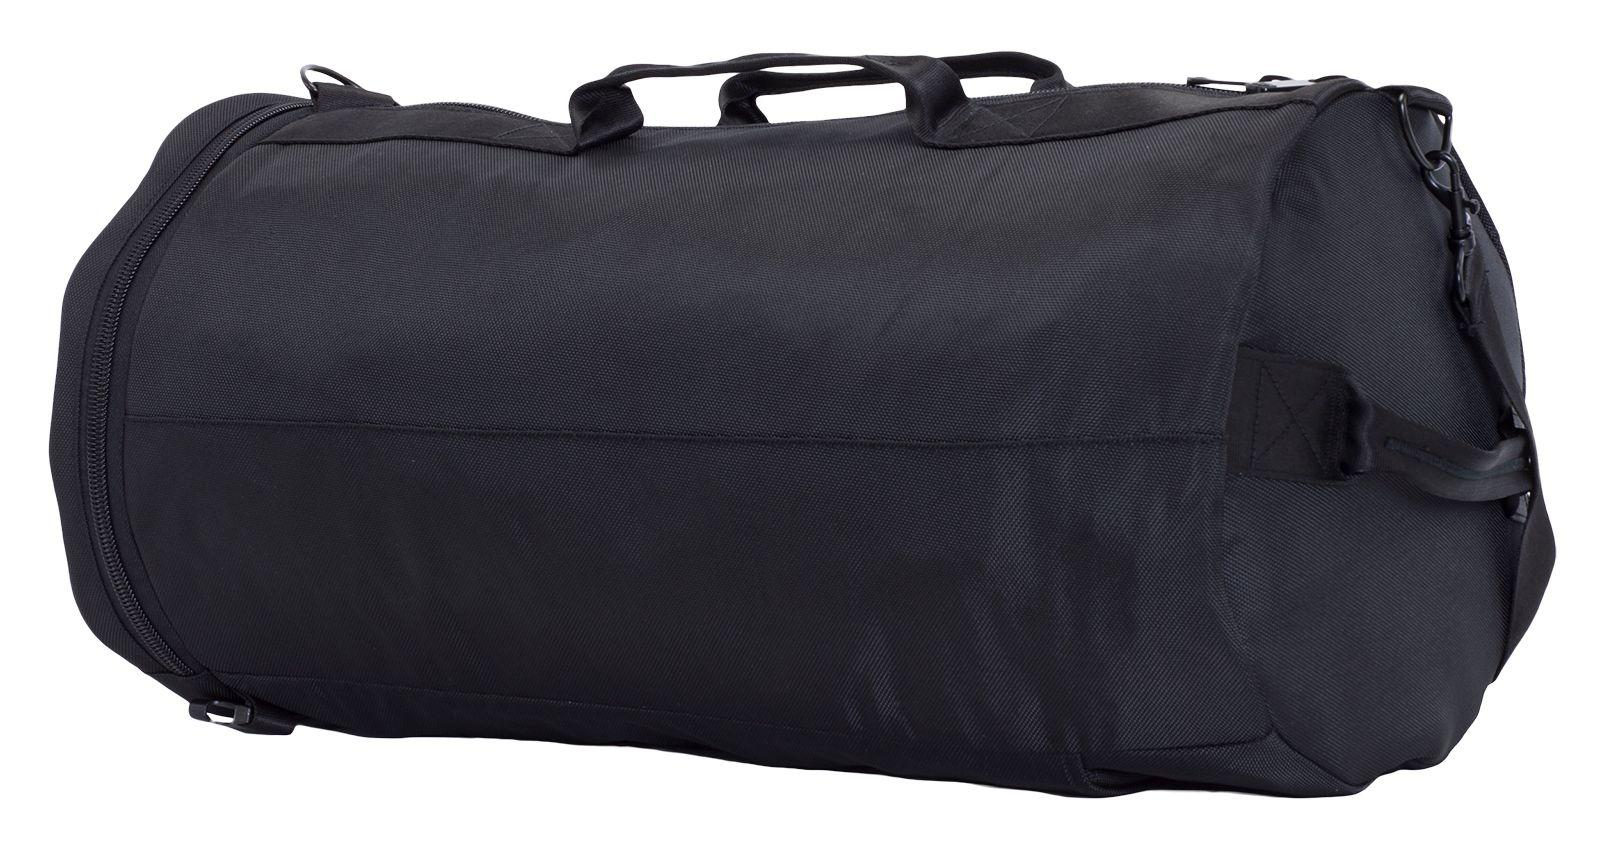 New Balance - Black Omni Convertible Duffel for Men - Lyst. View fullscreen 10058e093db37